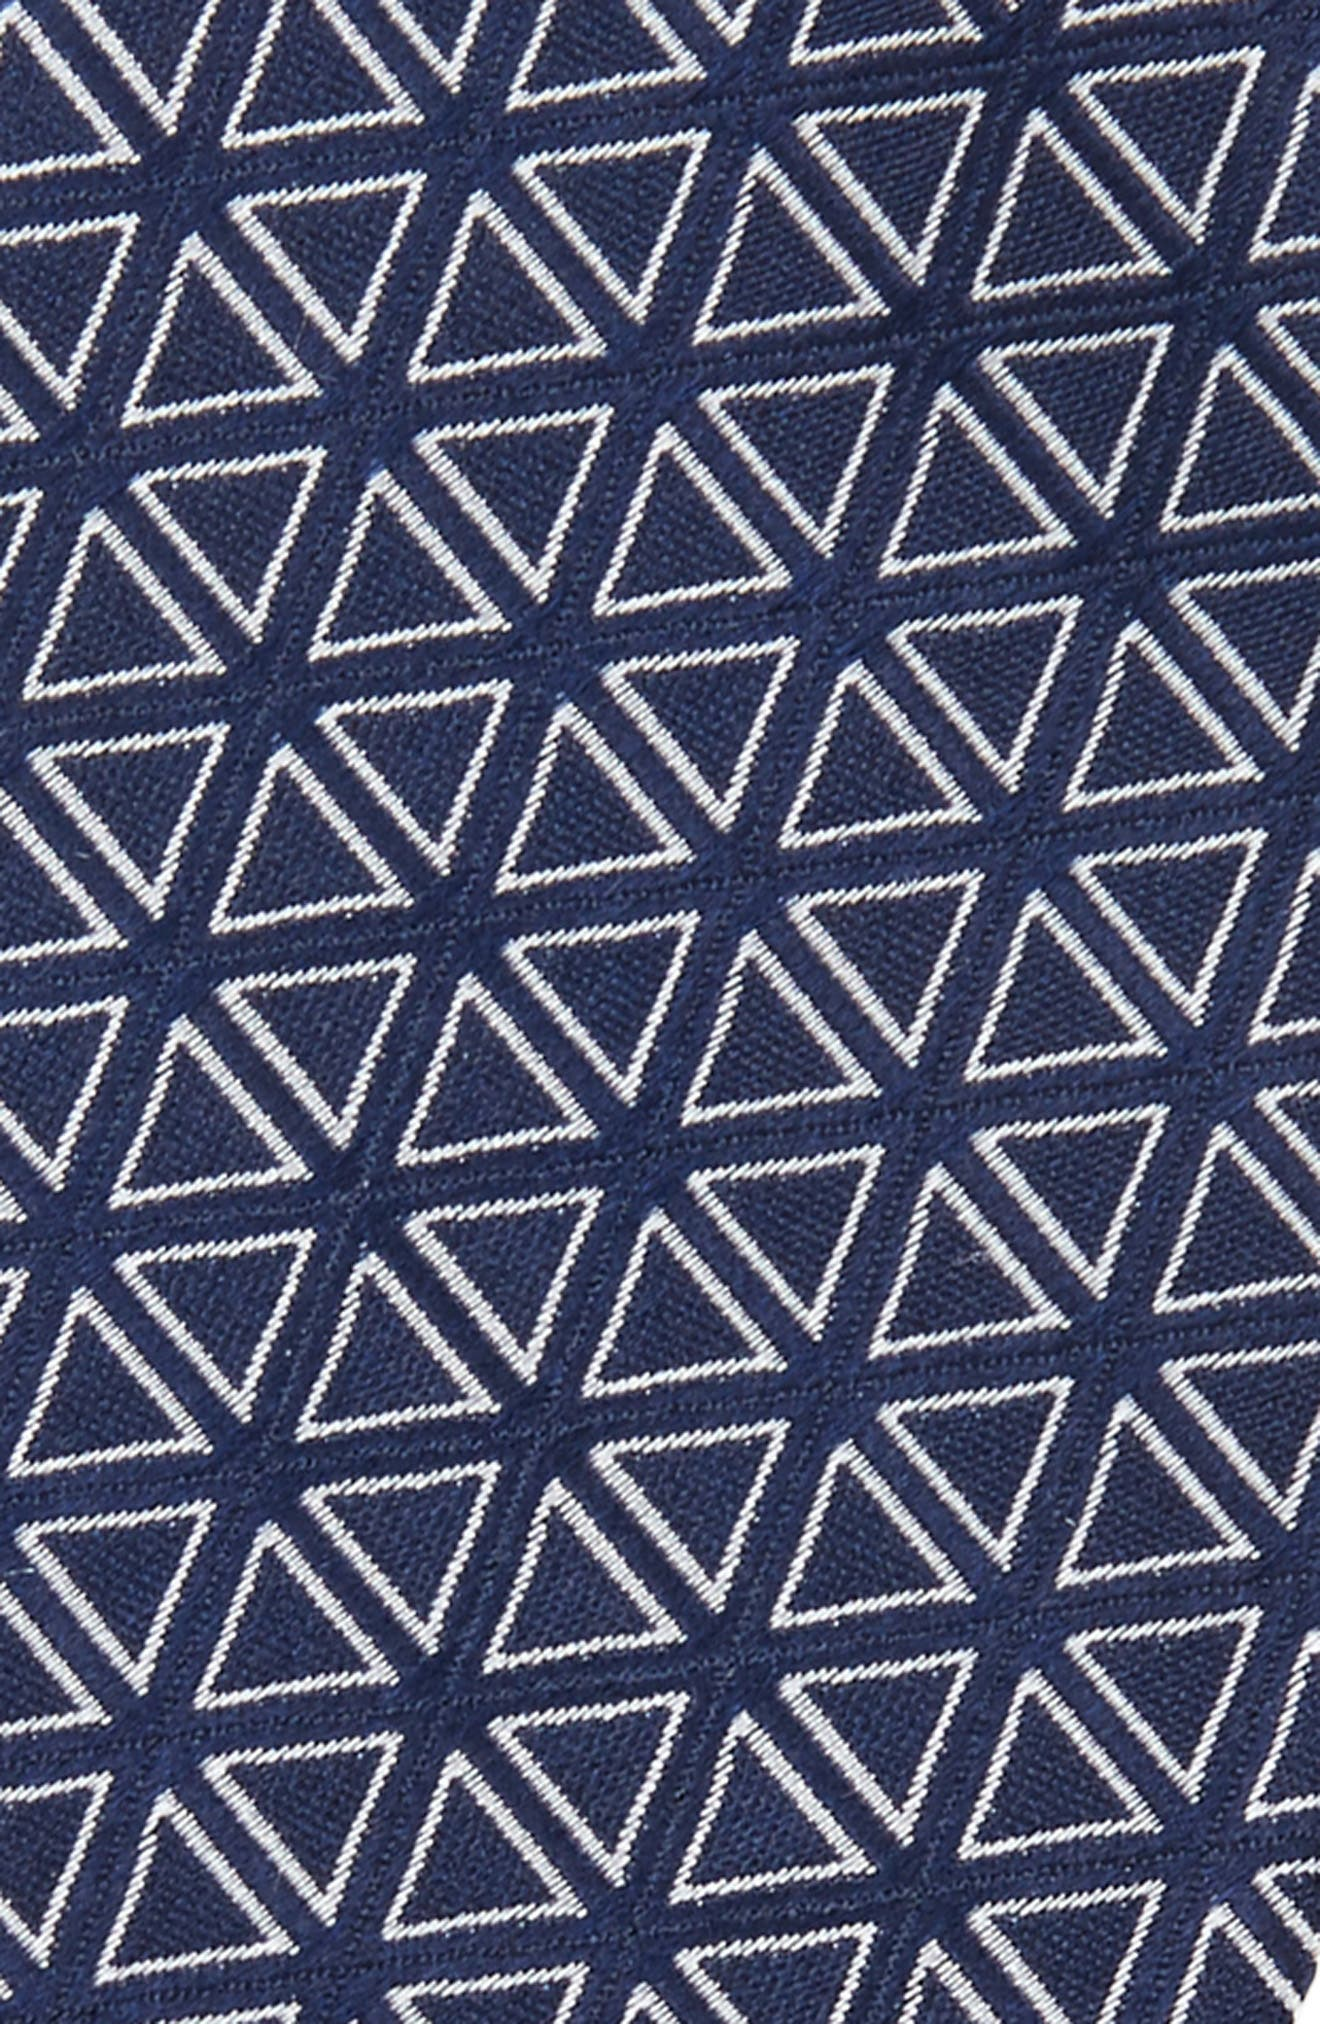 Alternate Image 3  - The Tie Bar Triad Silk Bow Tie